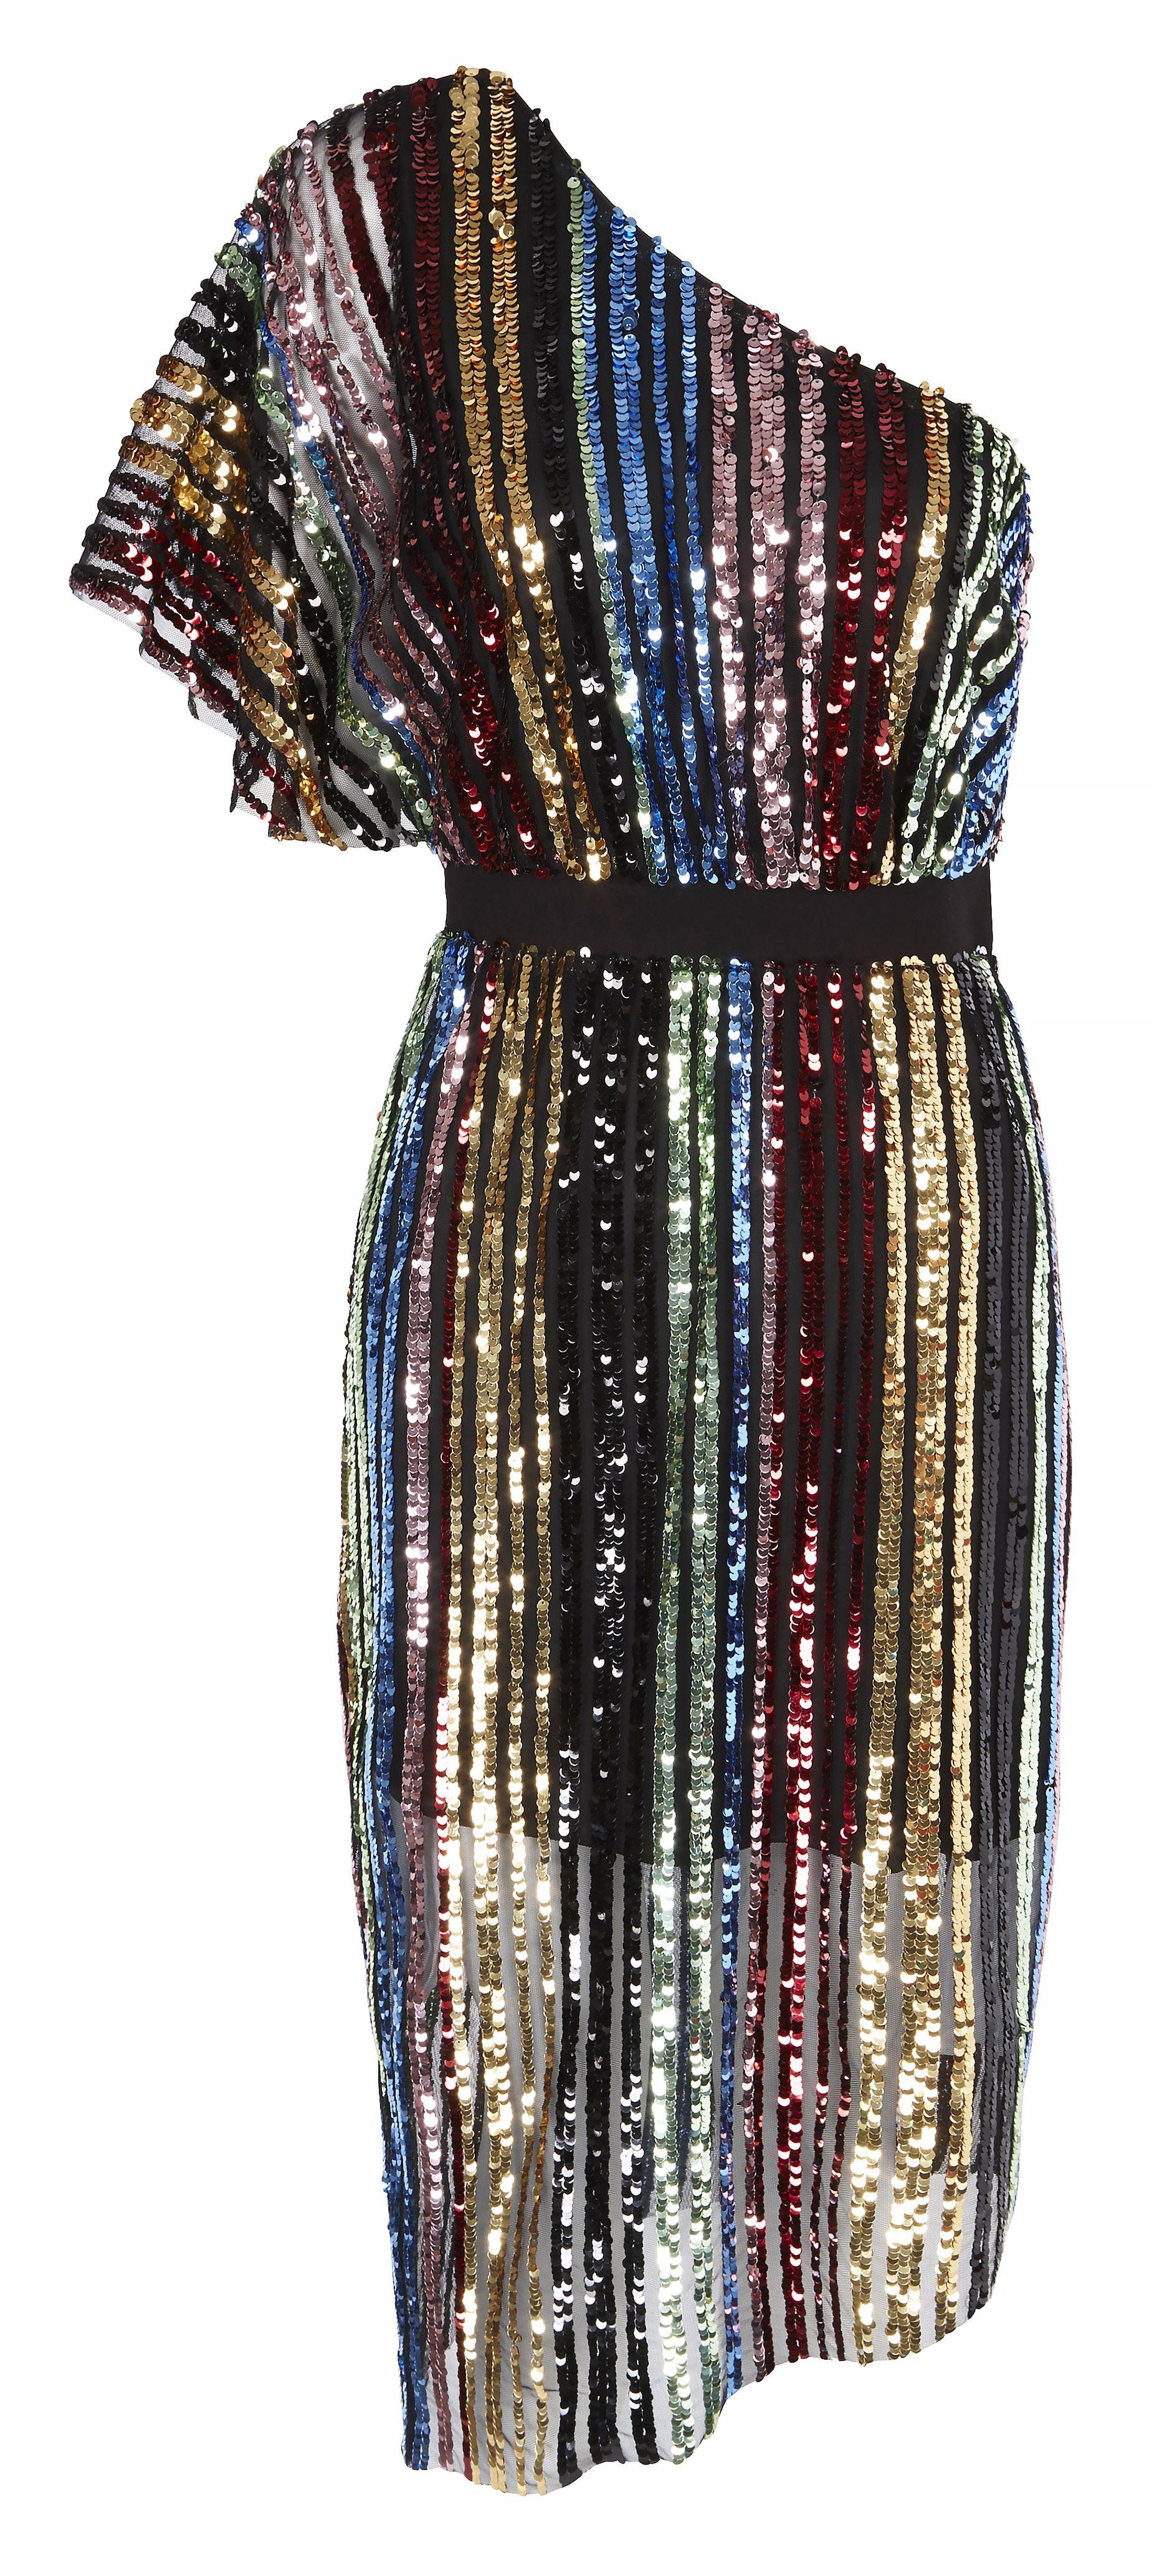 f8bc61e0ba6c33 Sequin Dress Uk Tesco - Photo Dress Wallpaper HD AOrg